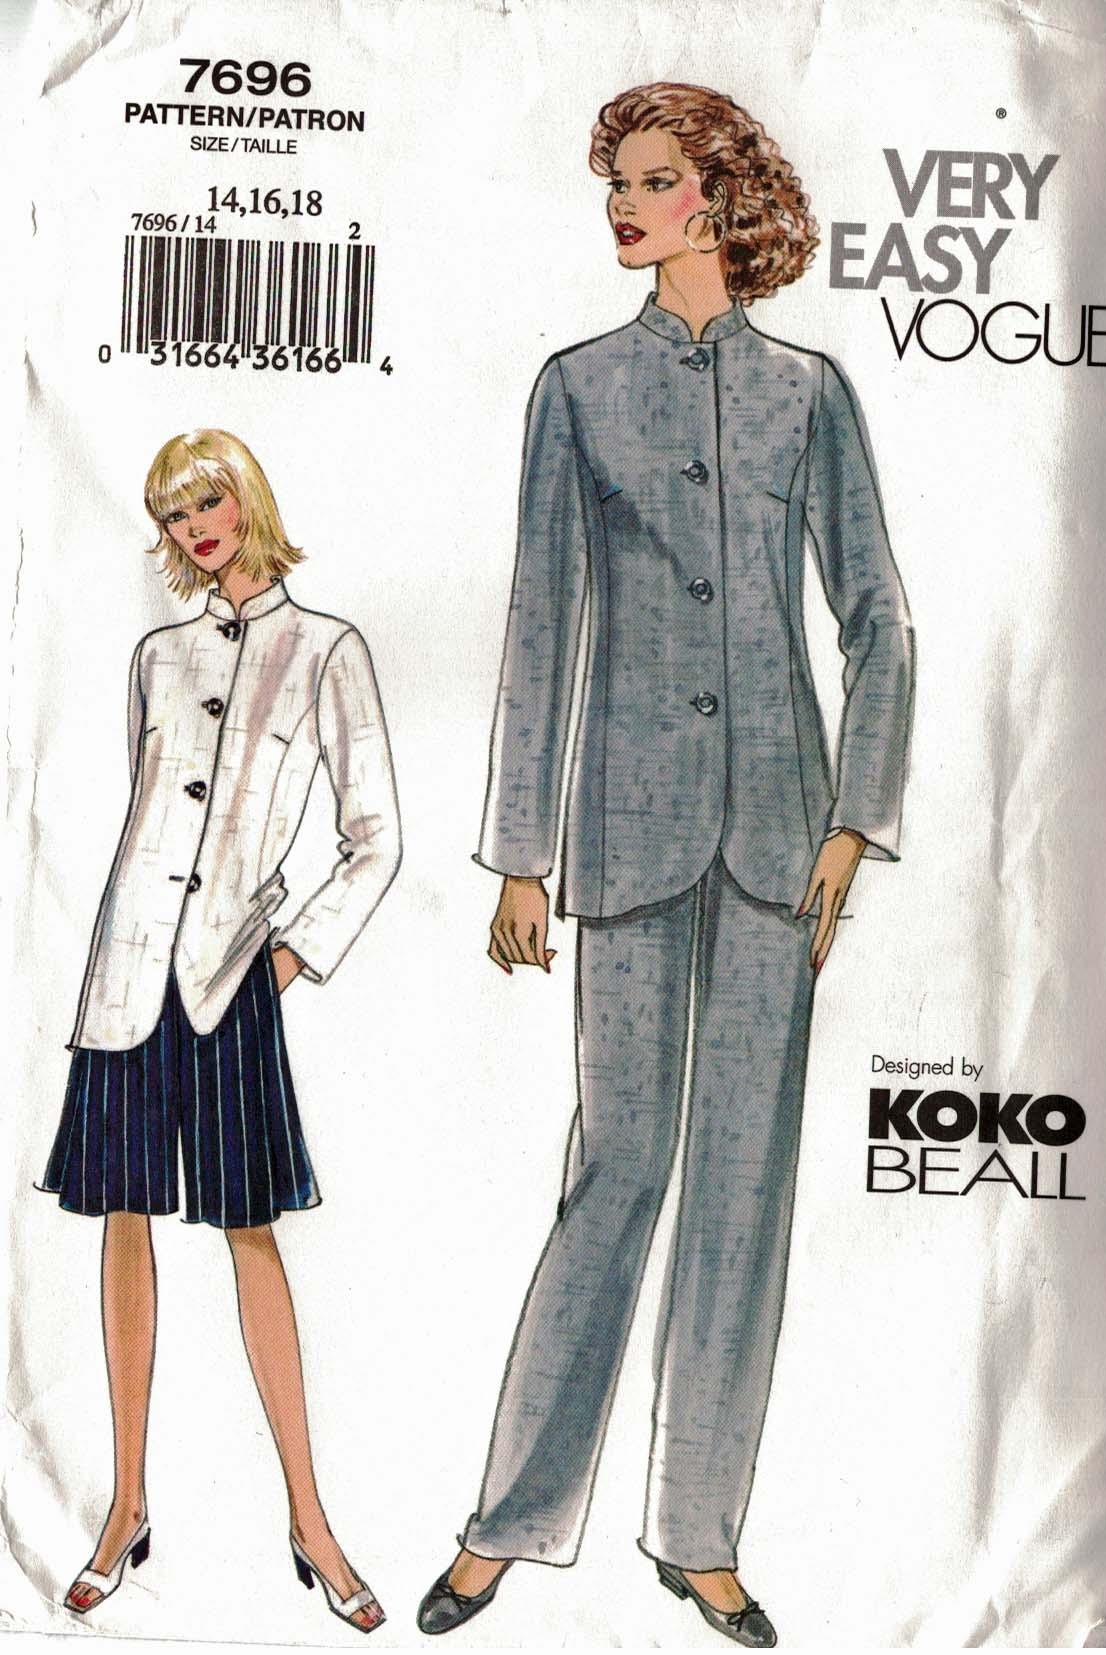 A Koko Beall pattern in my stash